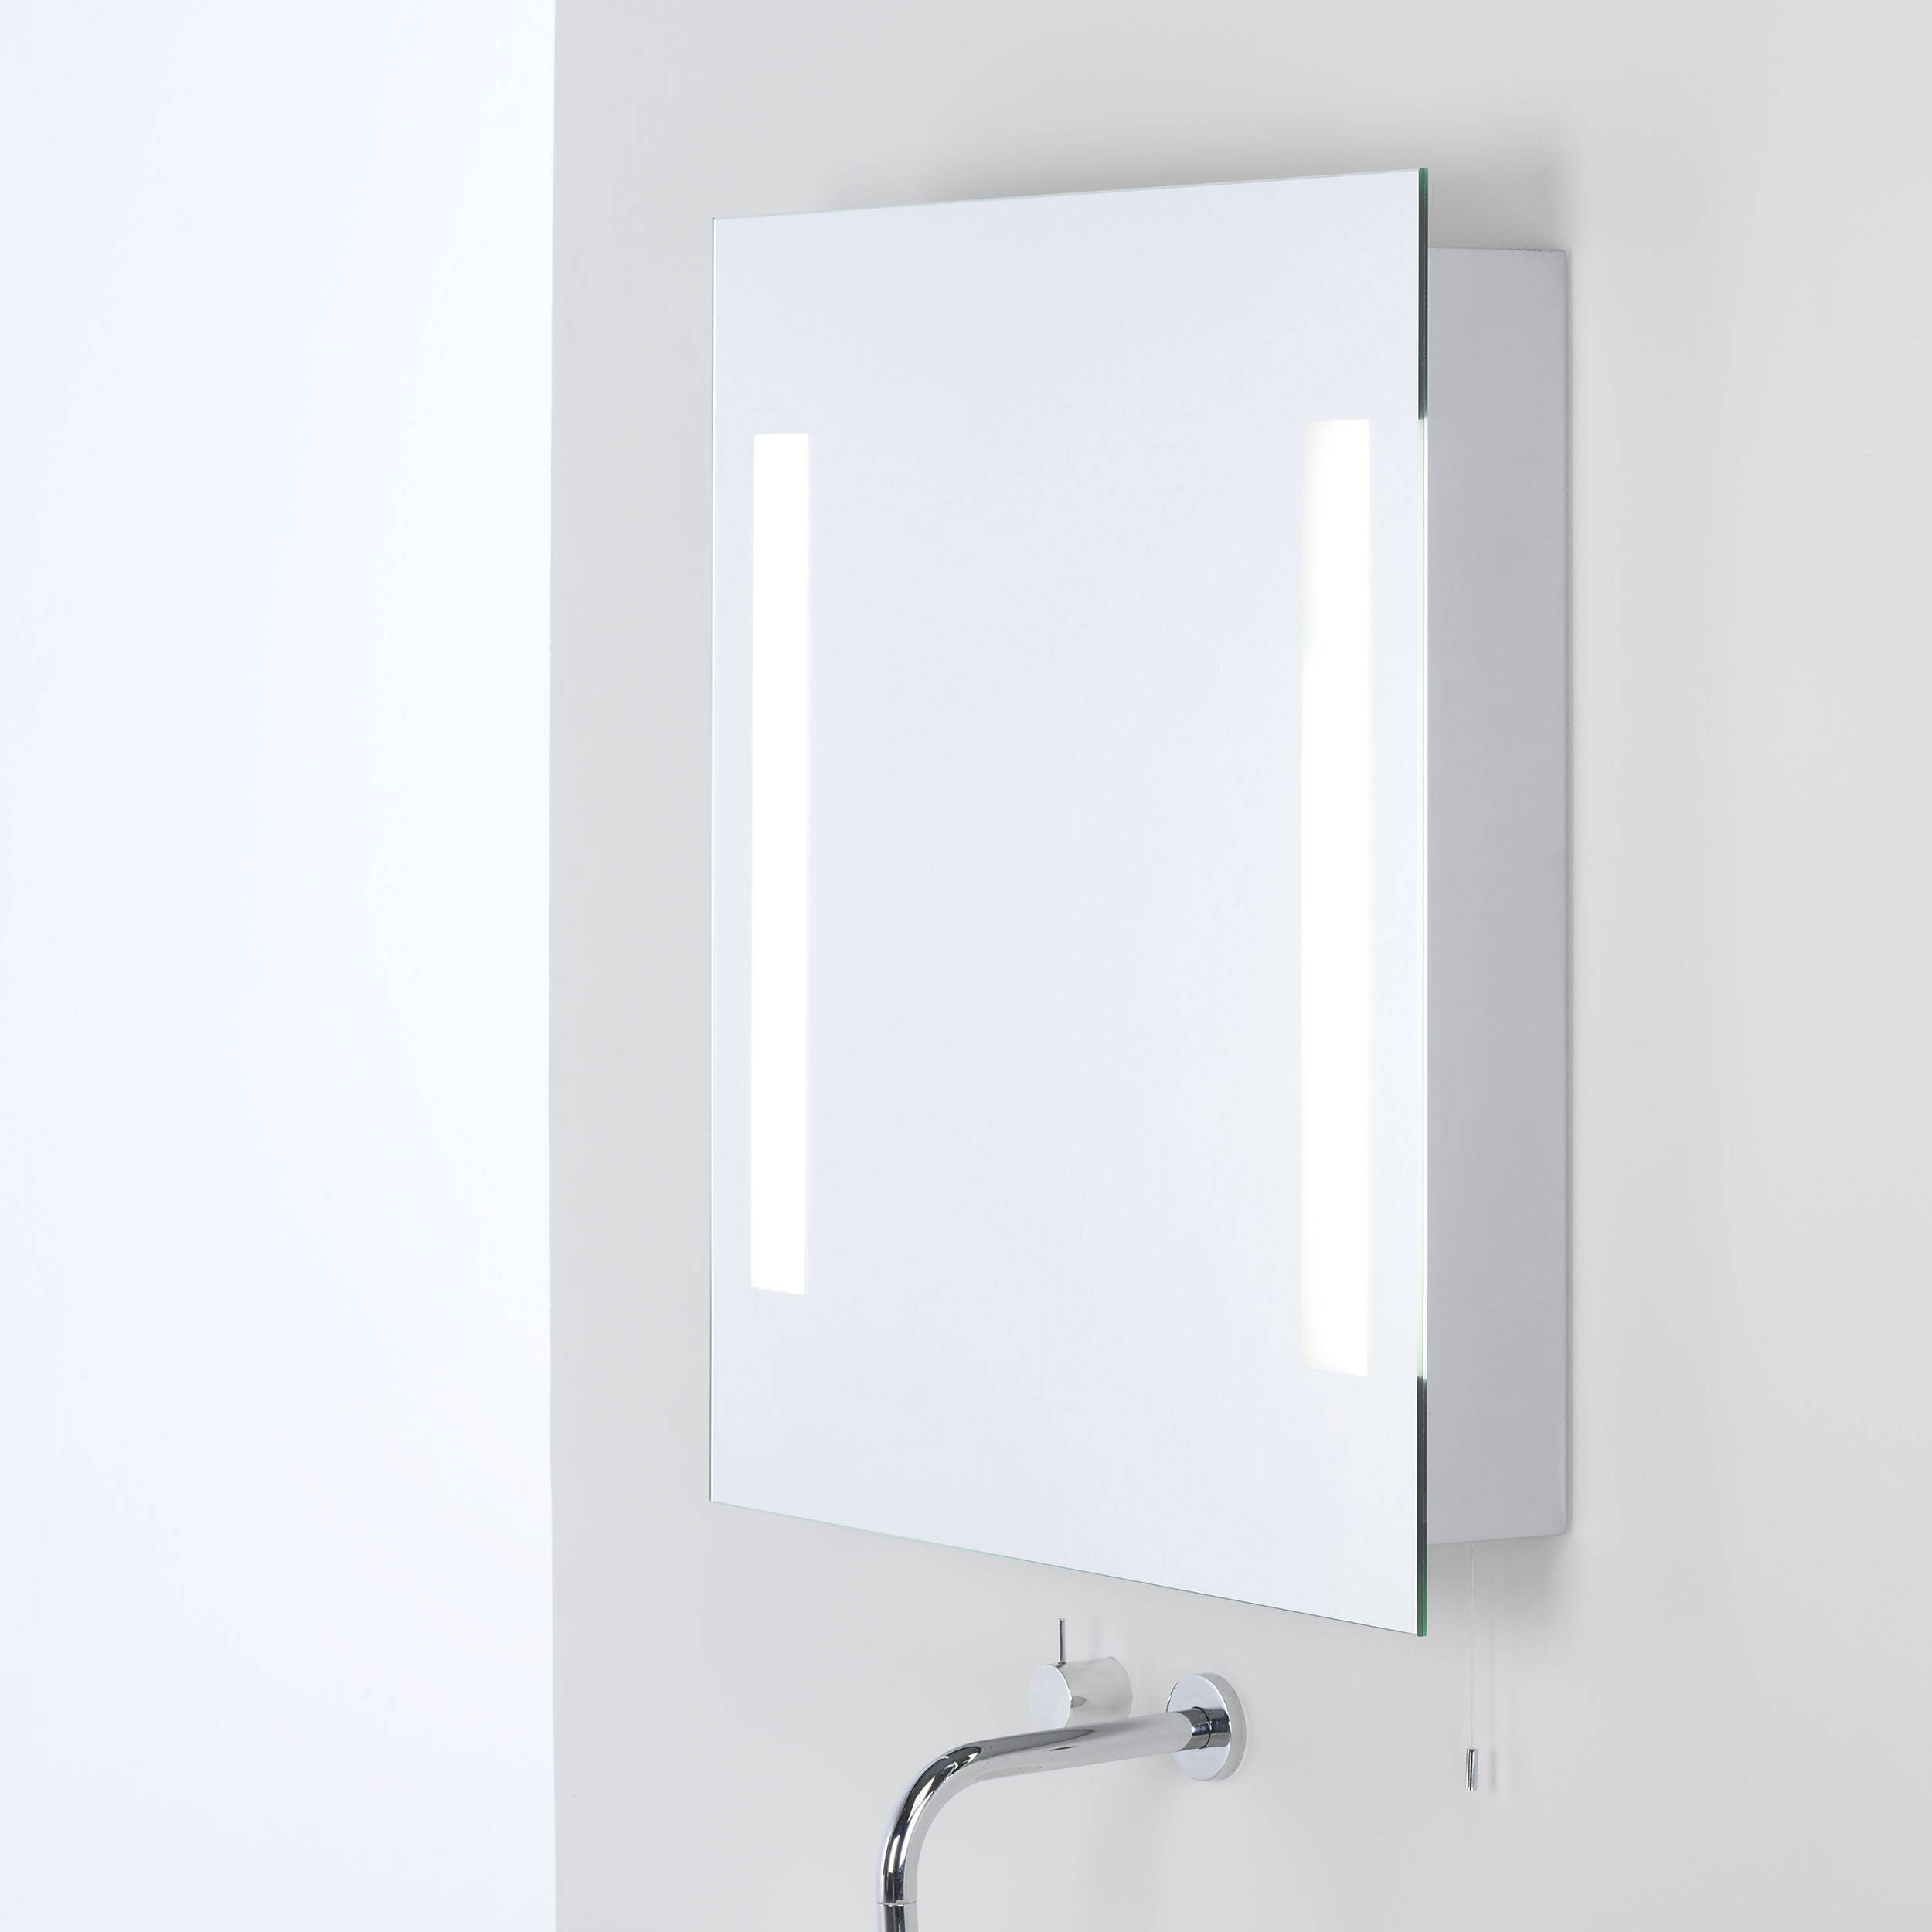 2 Light Illuminated Bathroom Mirror Cabinet Light Ip44 within measurements 2500 X 2500